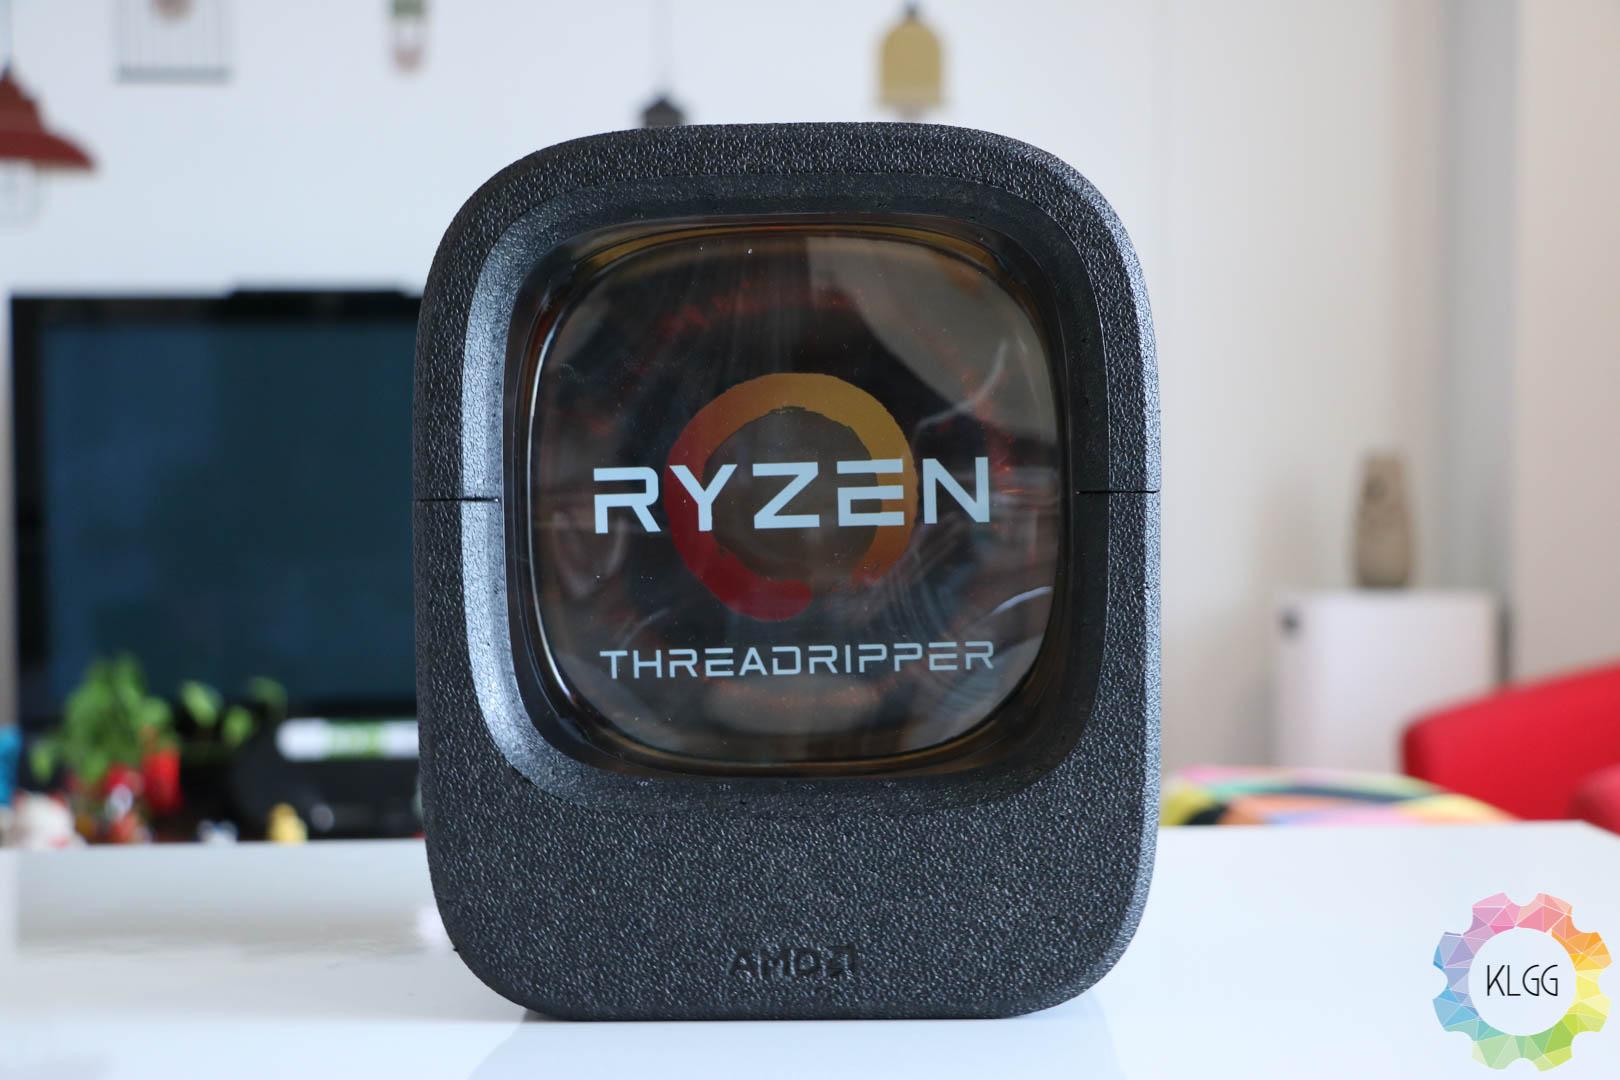 AMD Ryzen Threadripper 1950X Review: A Beast in the multi-threaded department 30